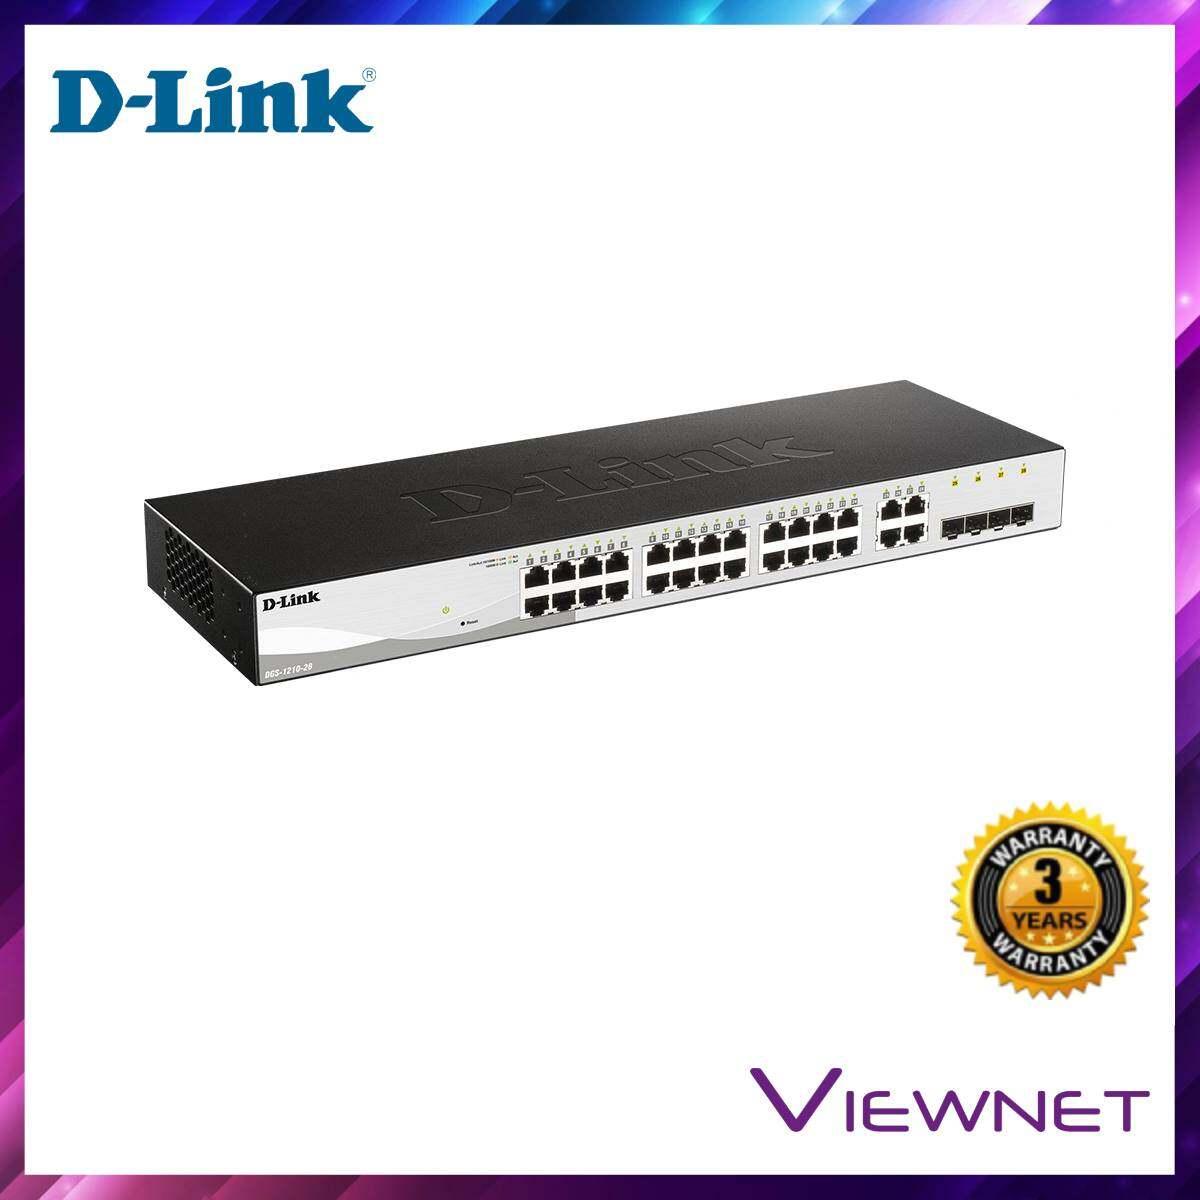 D-Link GGB 24-Port + 4-Port SFP Smart Switch (DGS-1210-28)